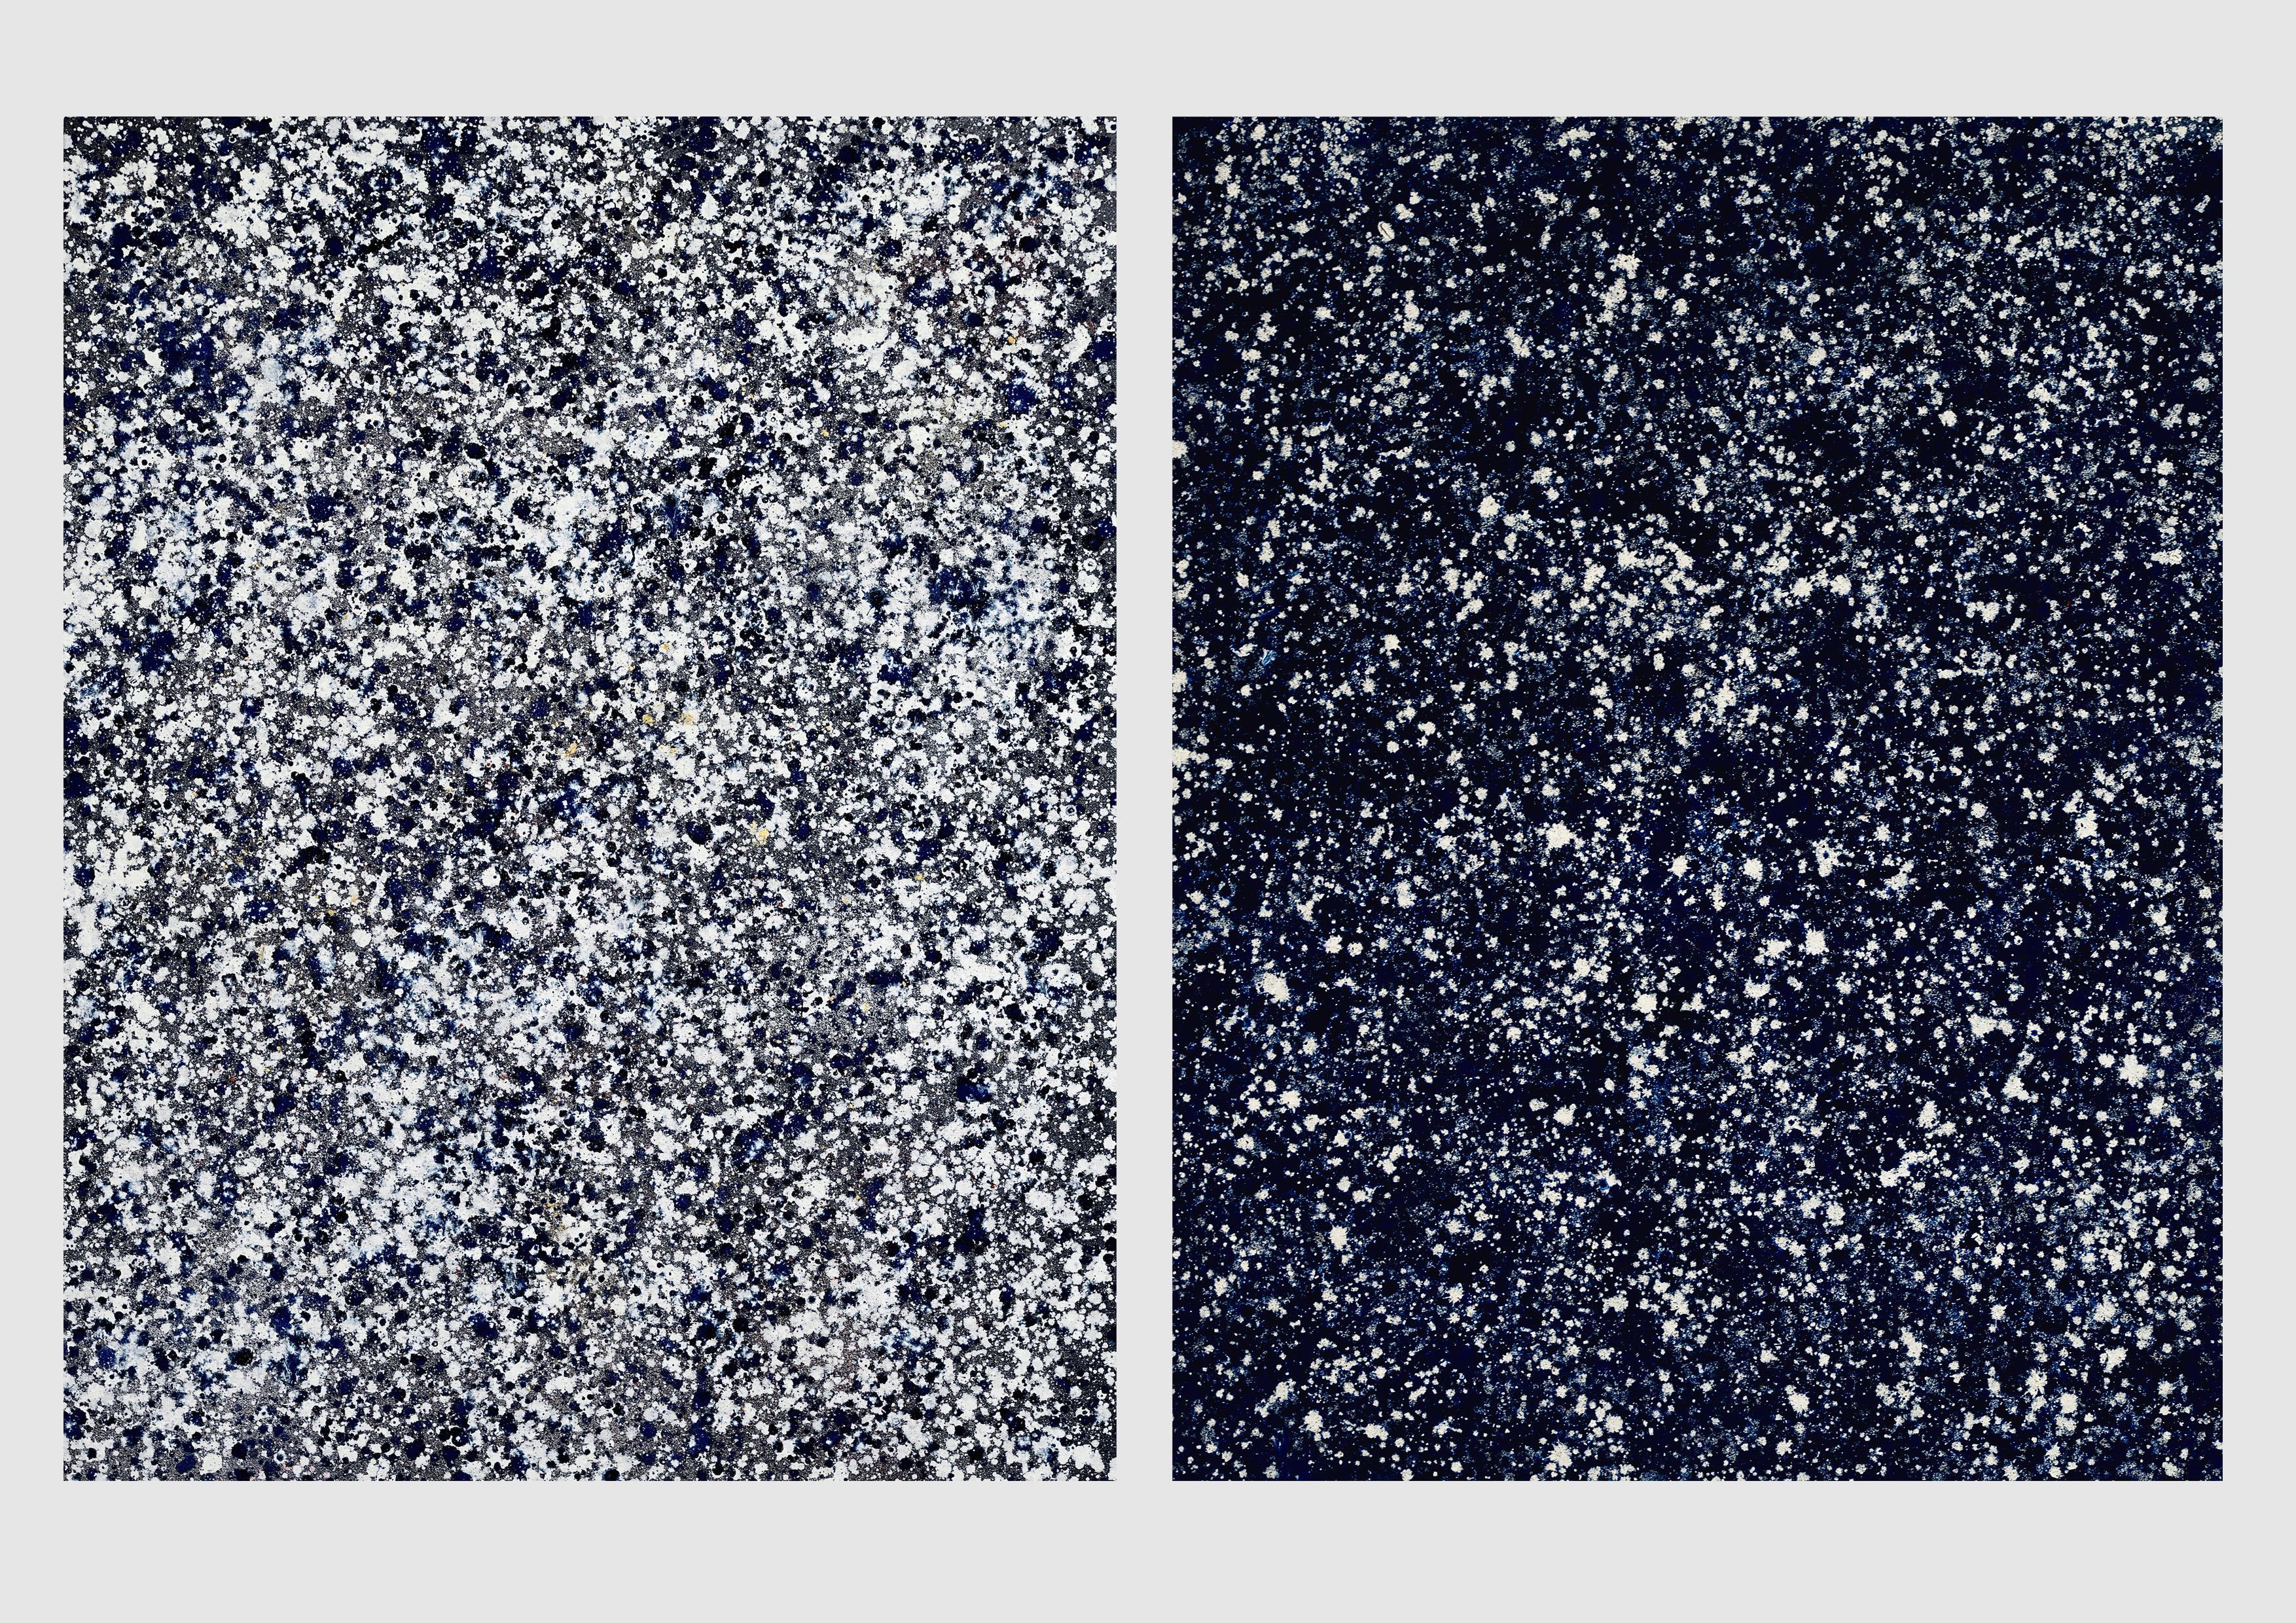 Snow Falling at Twilight - Tombe Du Ciel I & II / Diptych - Oil on Linen